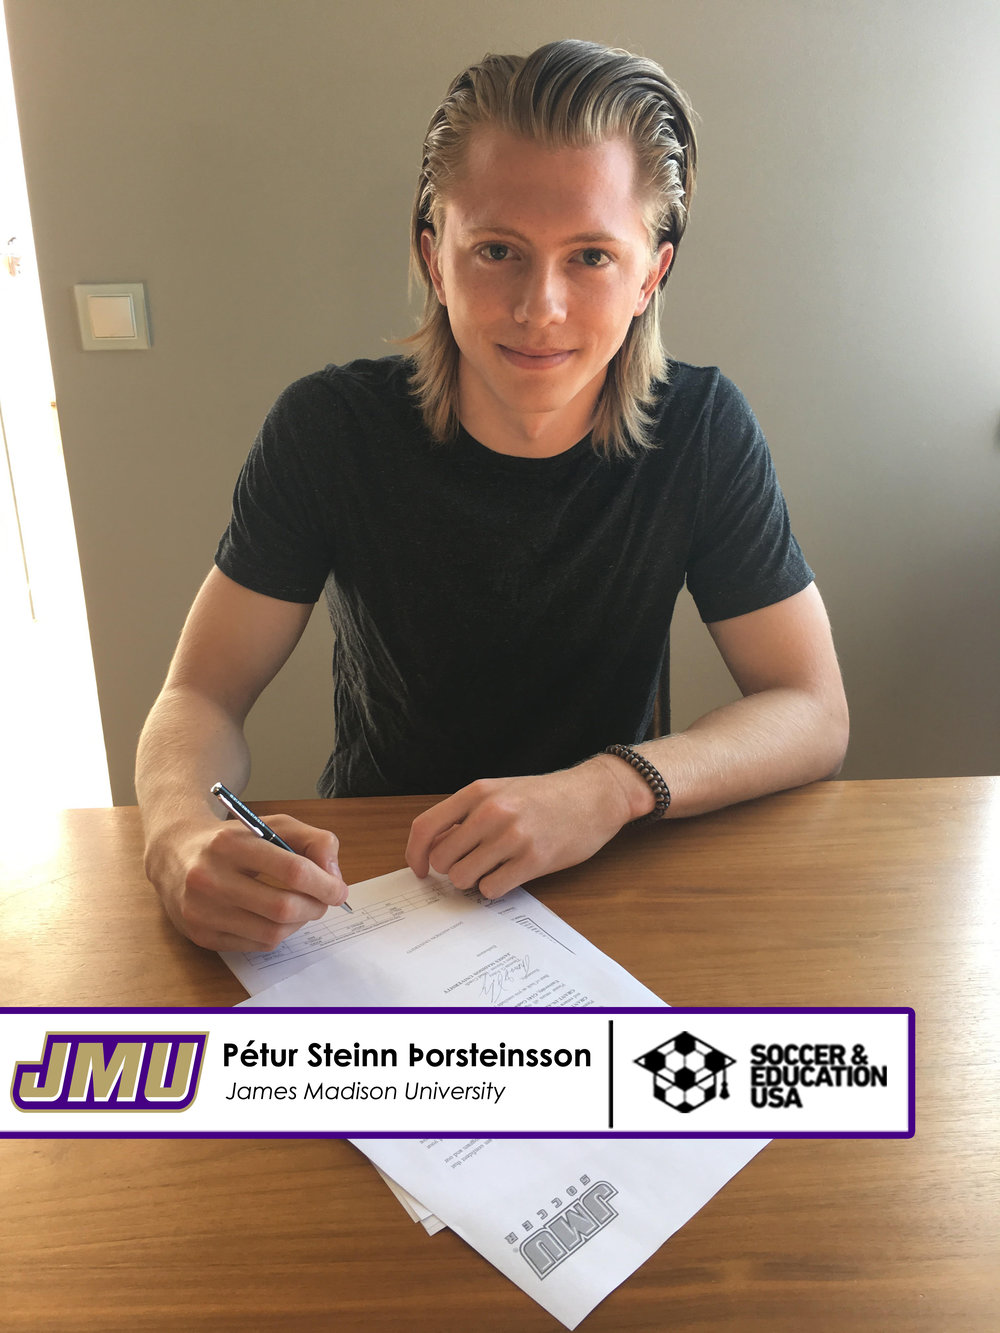 Petur Steinn - JMU